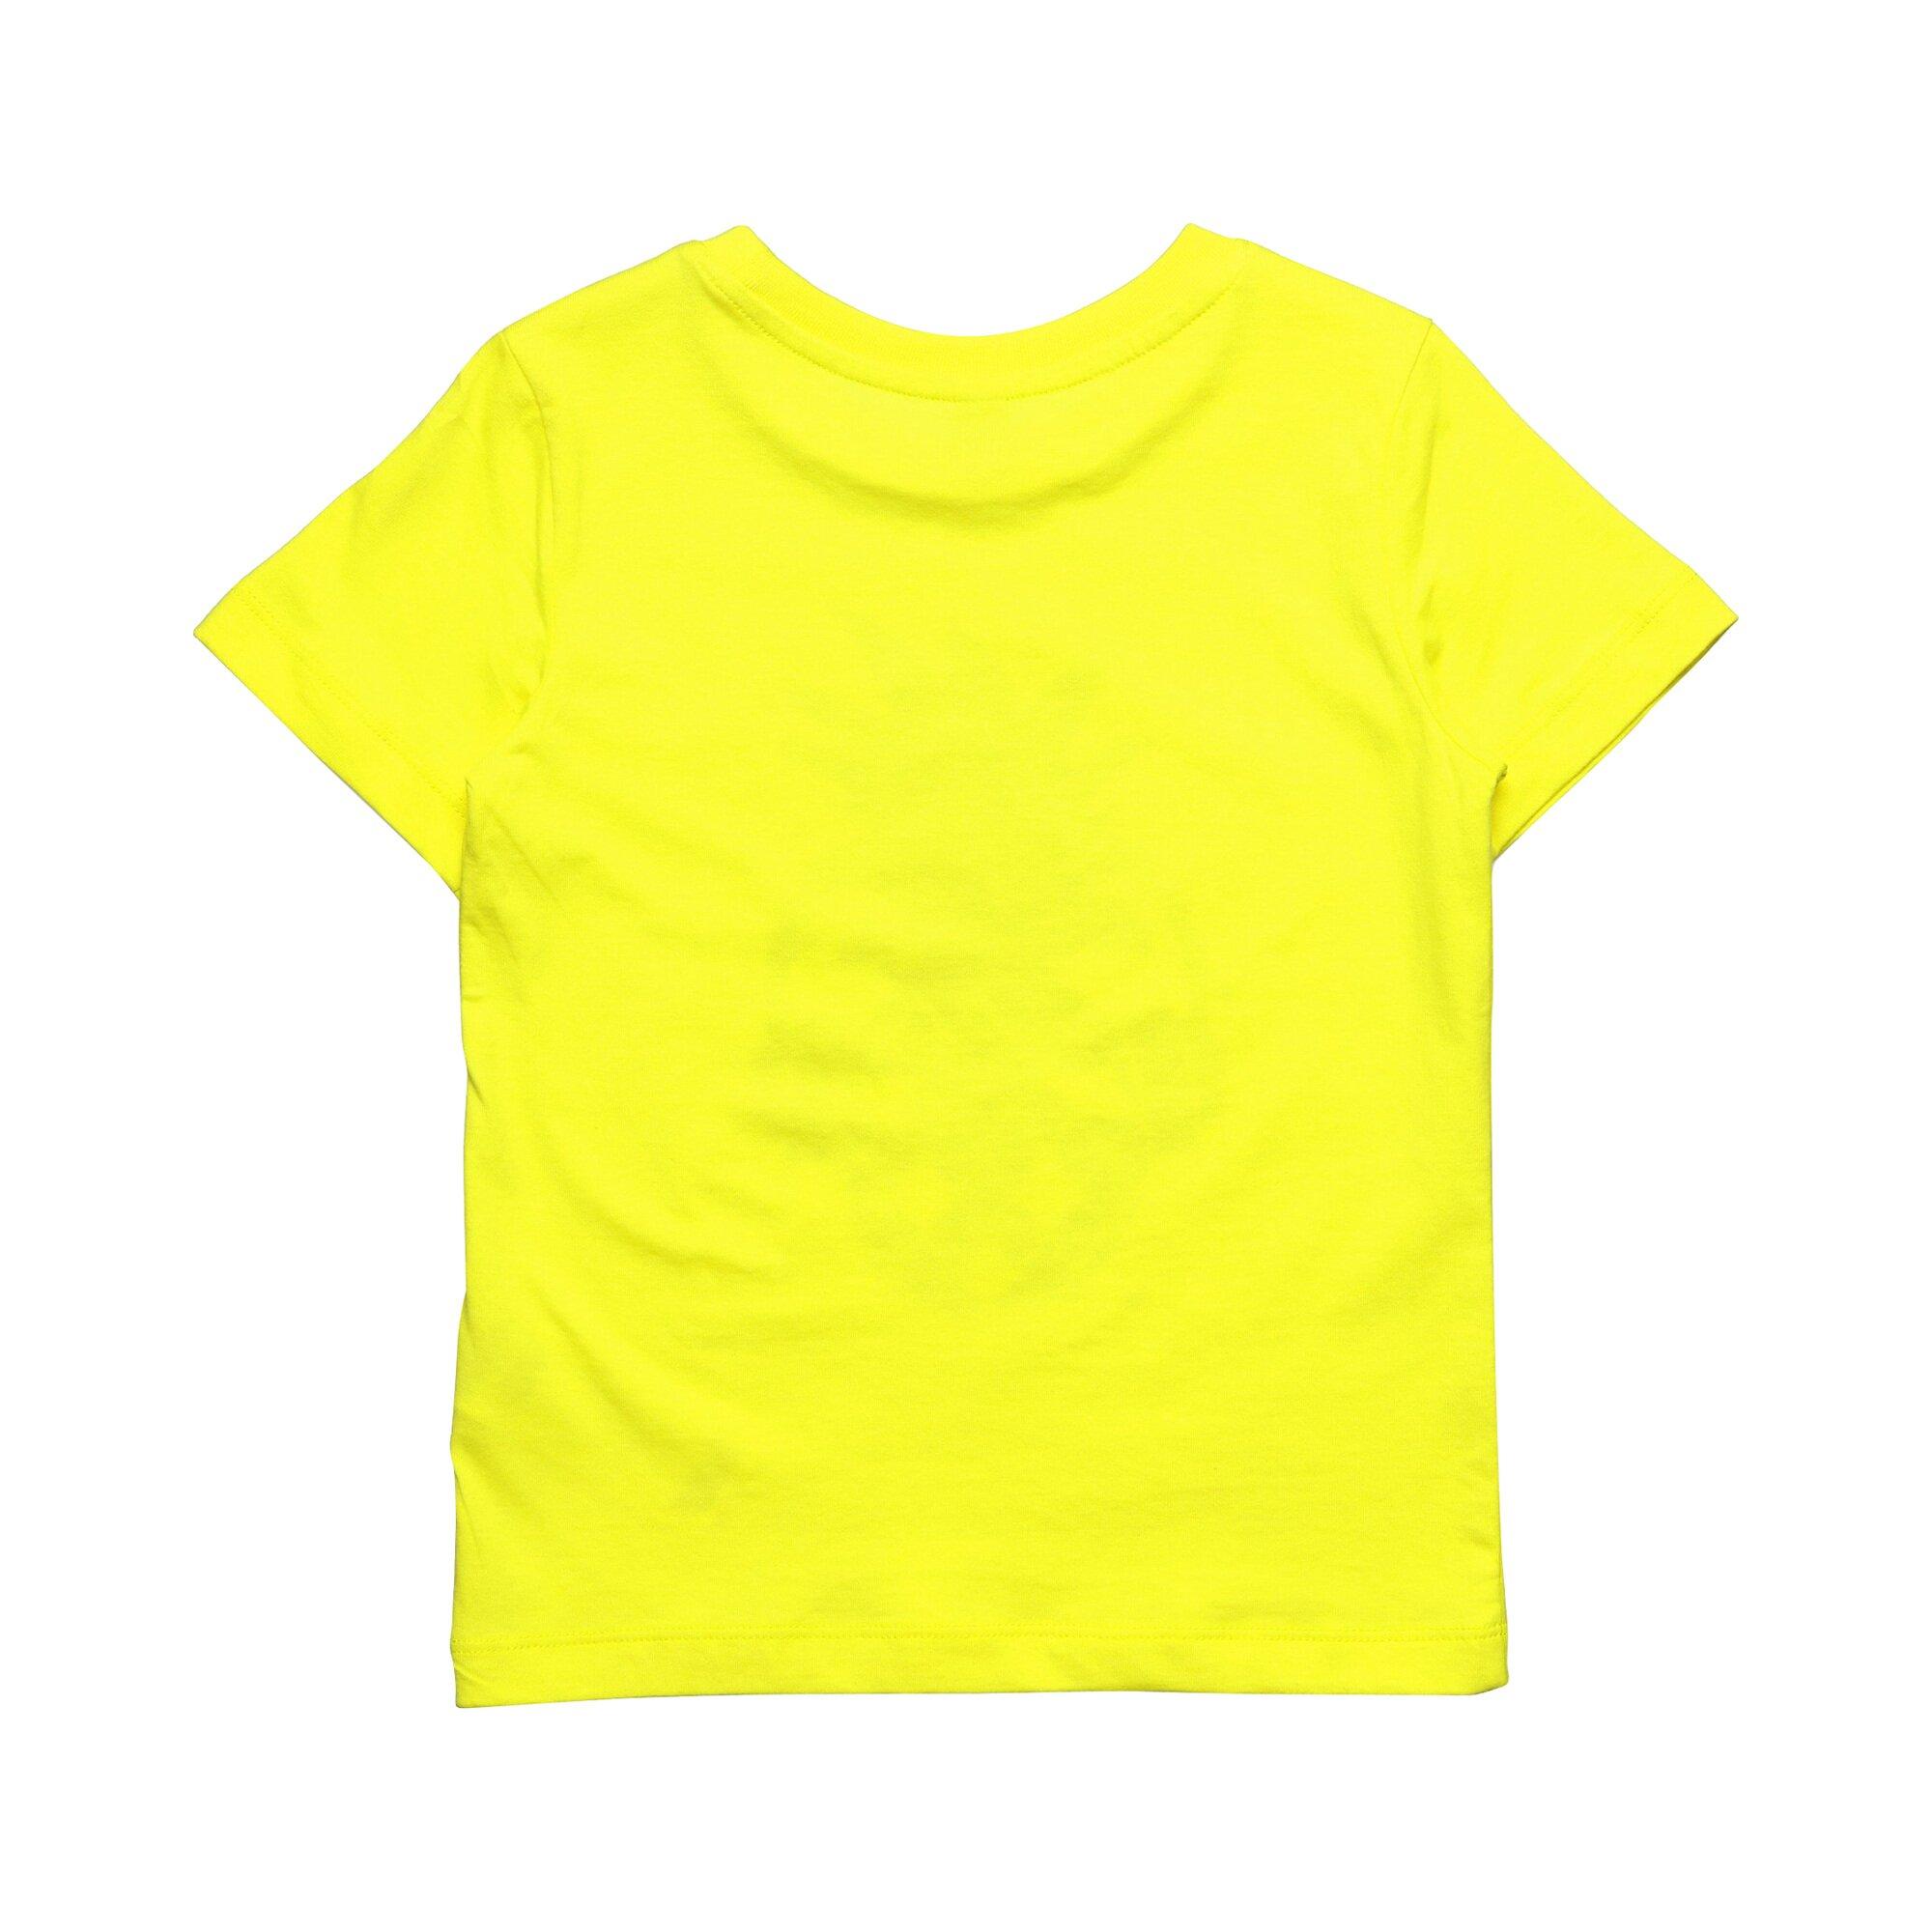 esprit-t-shirt-ananas-mit-kopfhorer